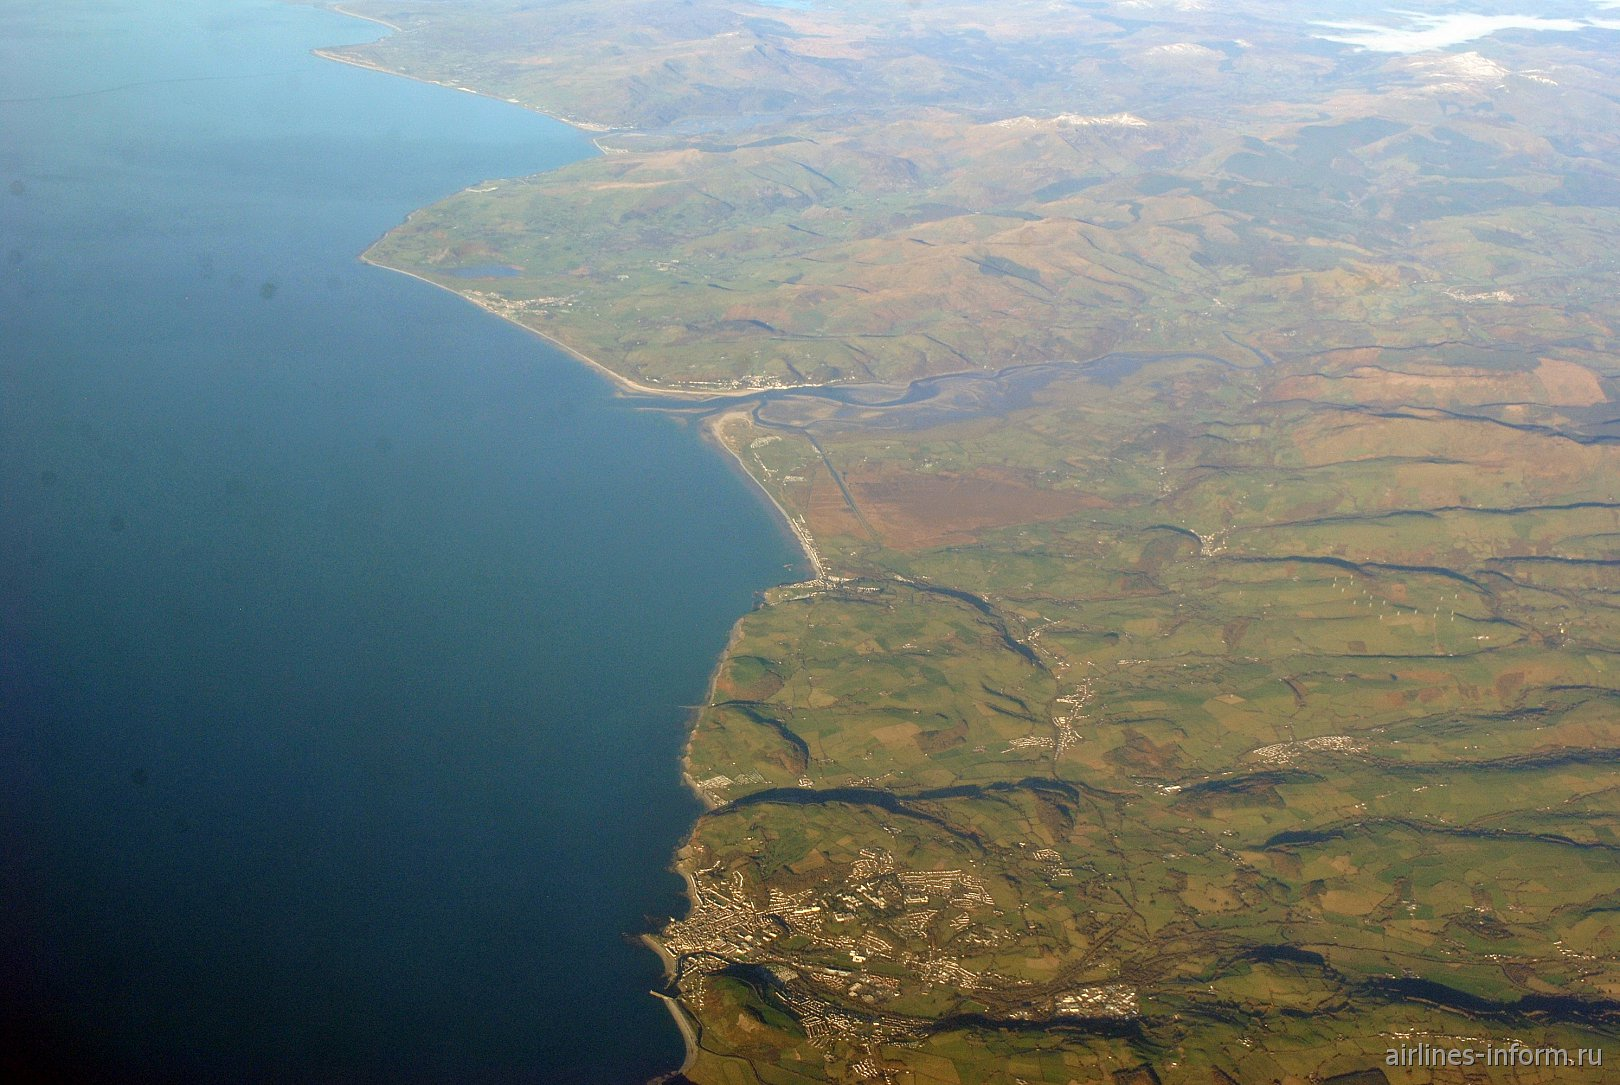 Побережье Ирландского моря у города Aberystwyth в Уэльсе